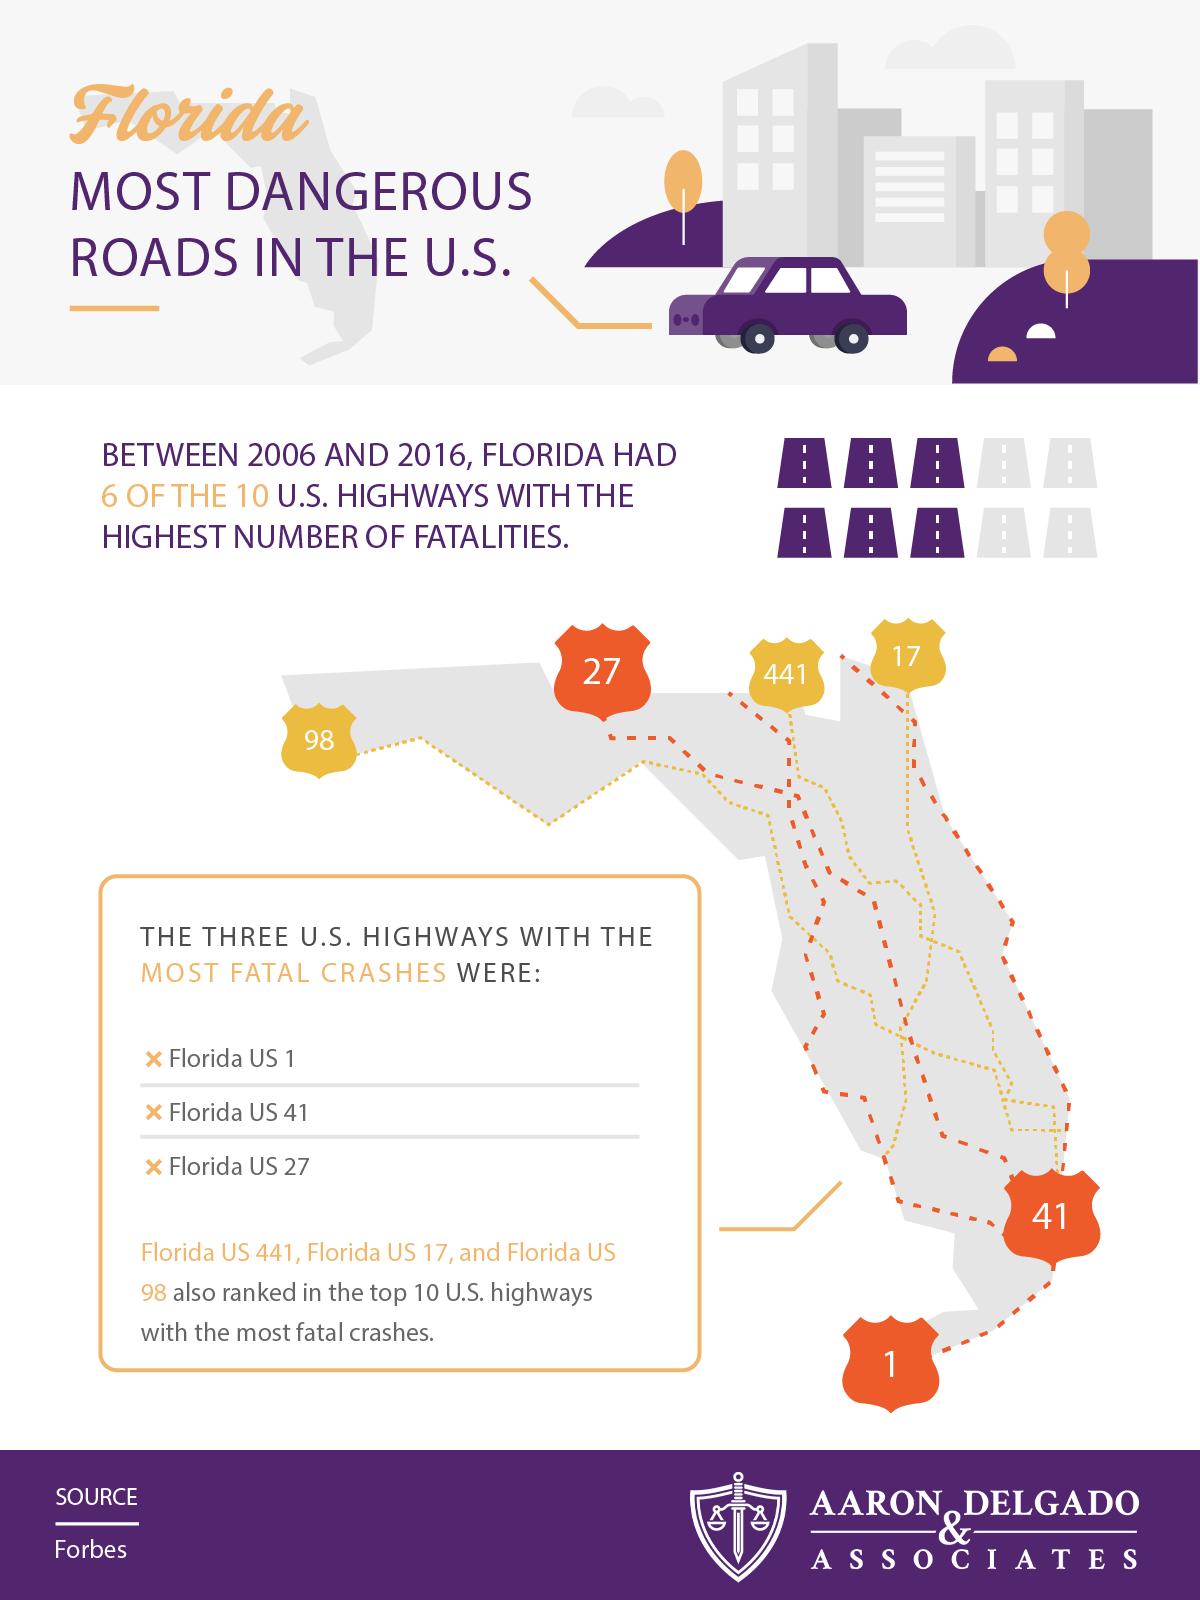 Florida's Most Dangerous Roads